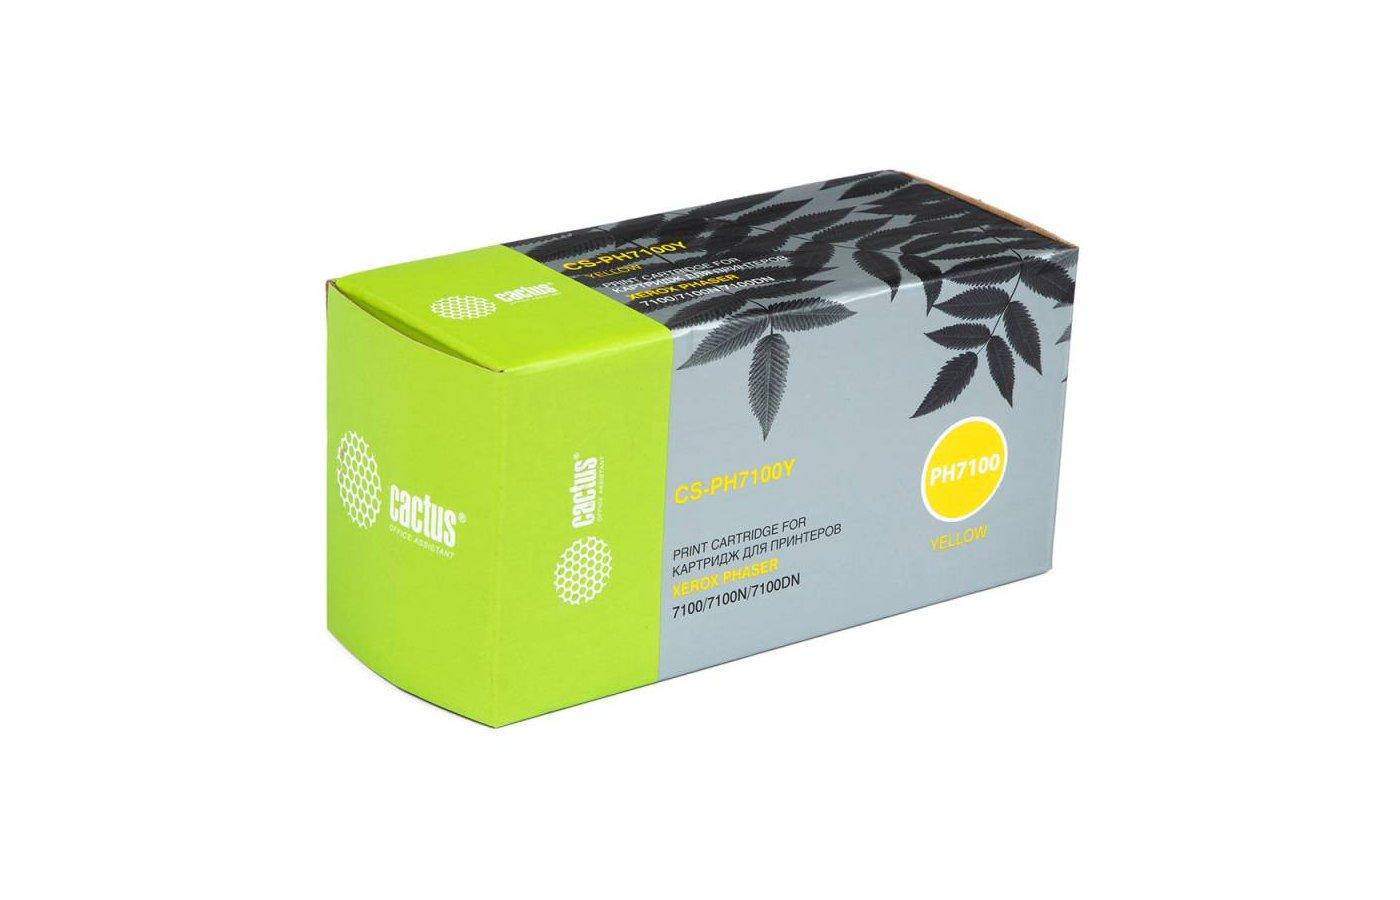 Картридж лазерный Cactus CS-PH7100Y (106R02608) совместимый желтый для Xerox Phaser 7100/7100N/7100DN (4500стр.)